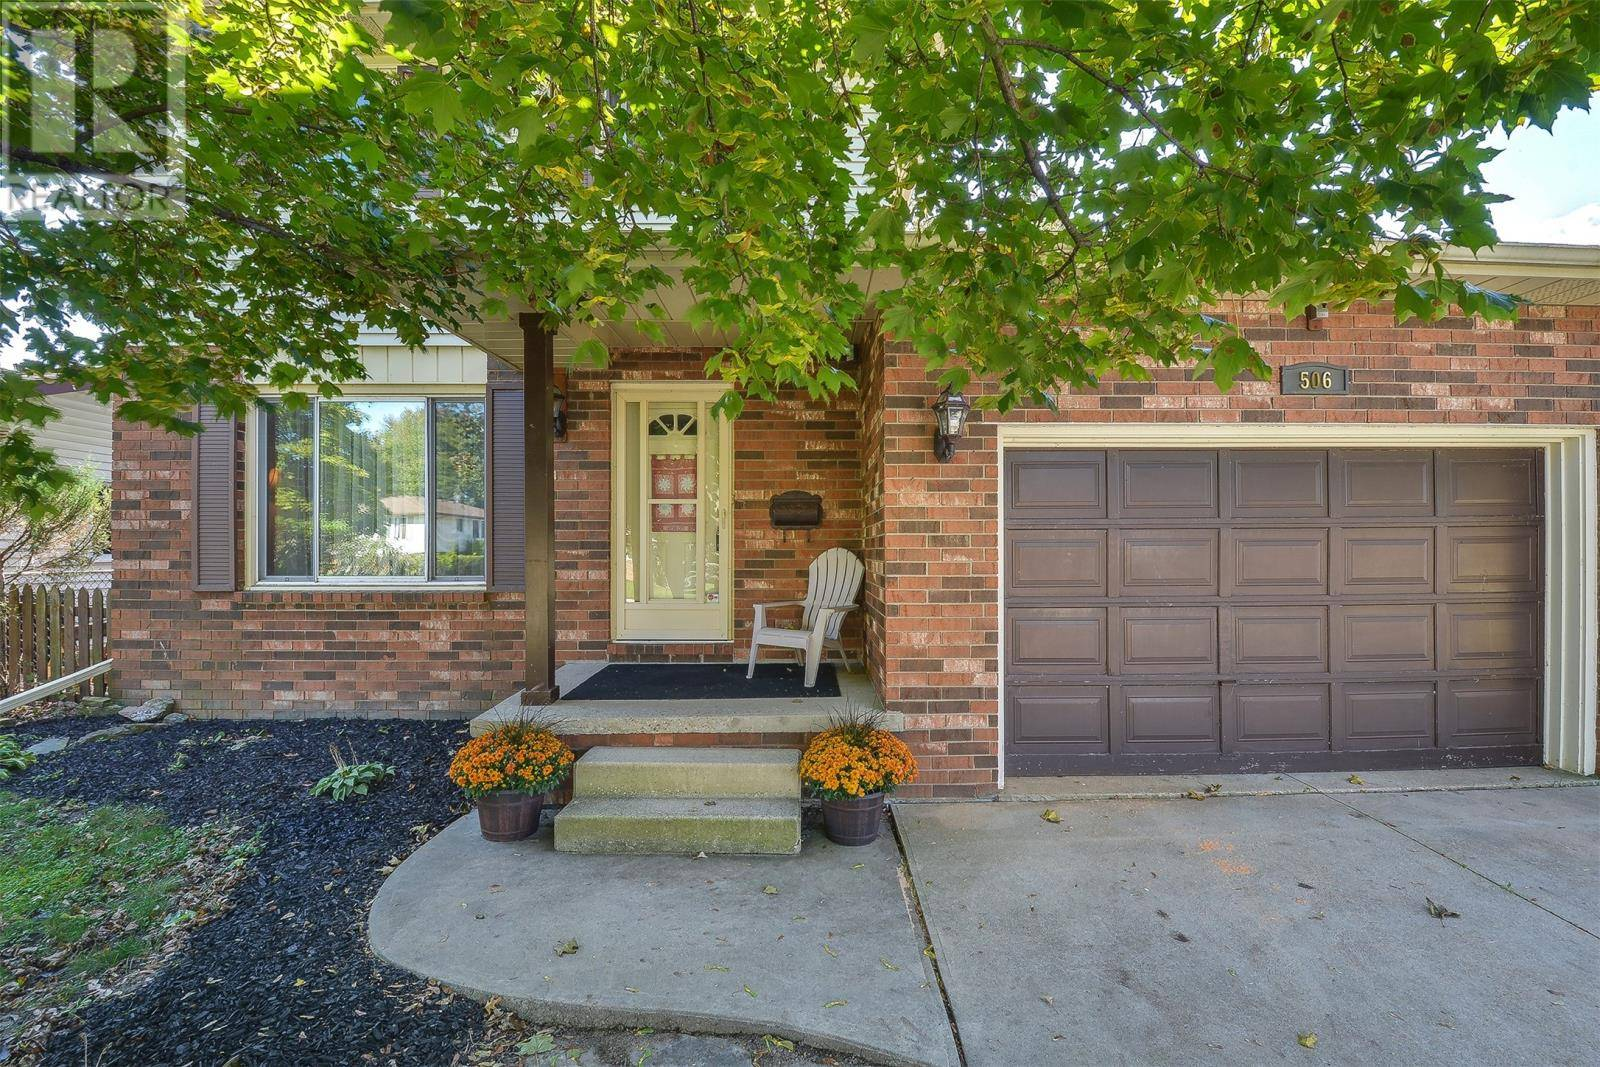 House for sale at 506 Desjardins  Belle River Ontario - MLS: 20001574